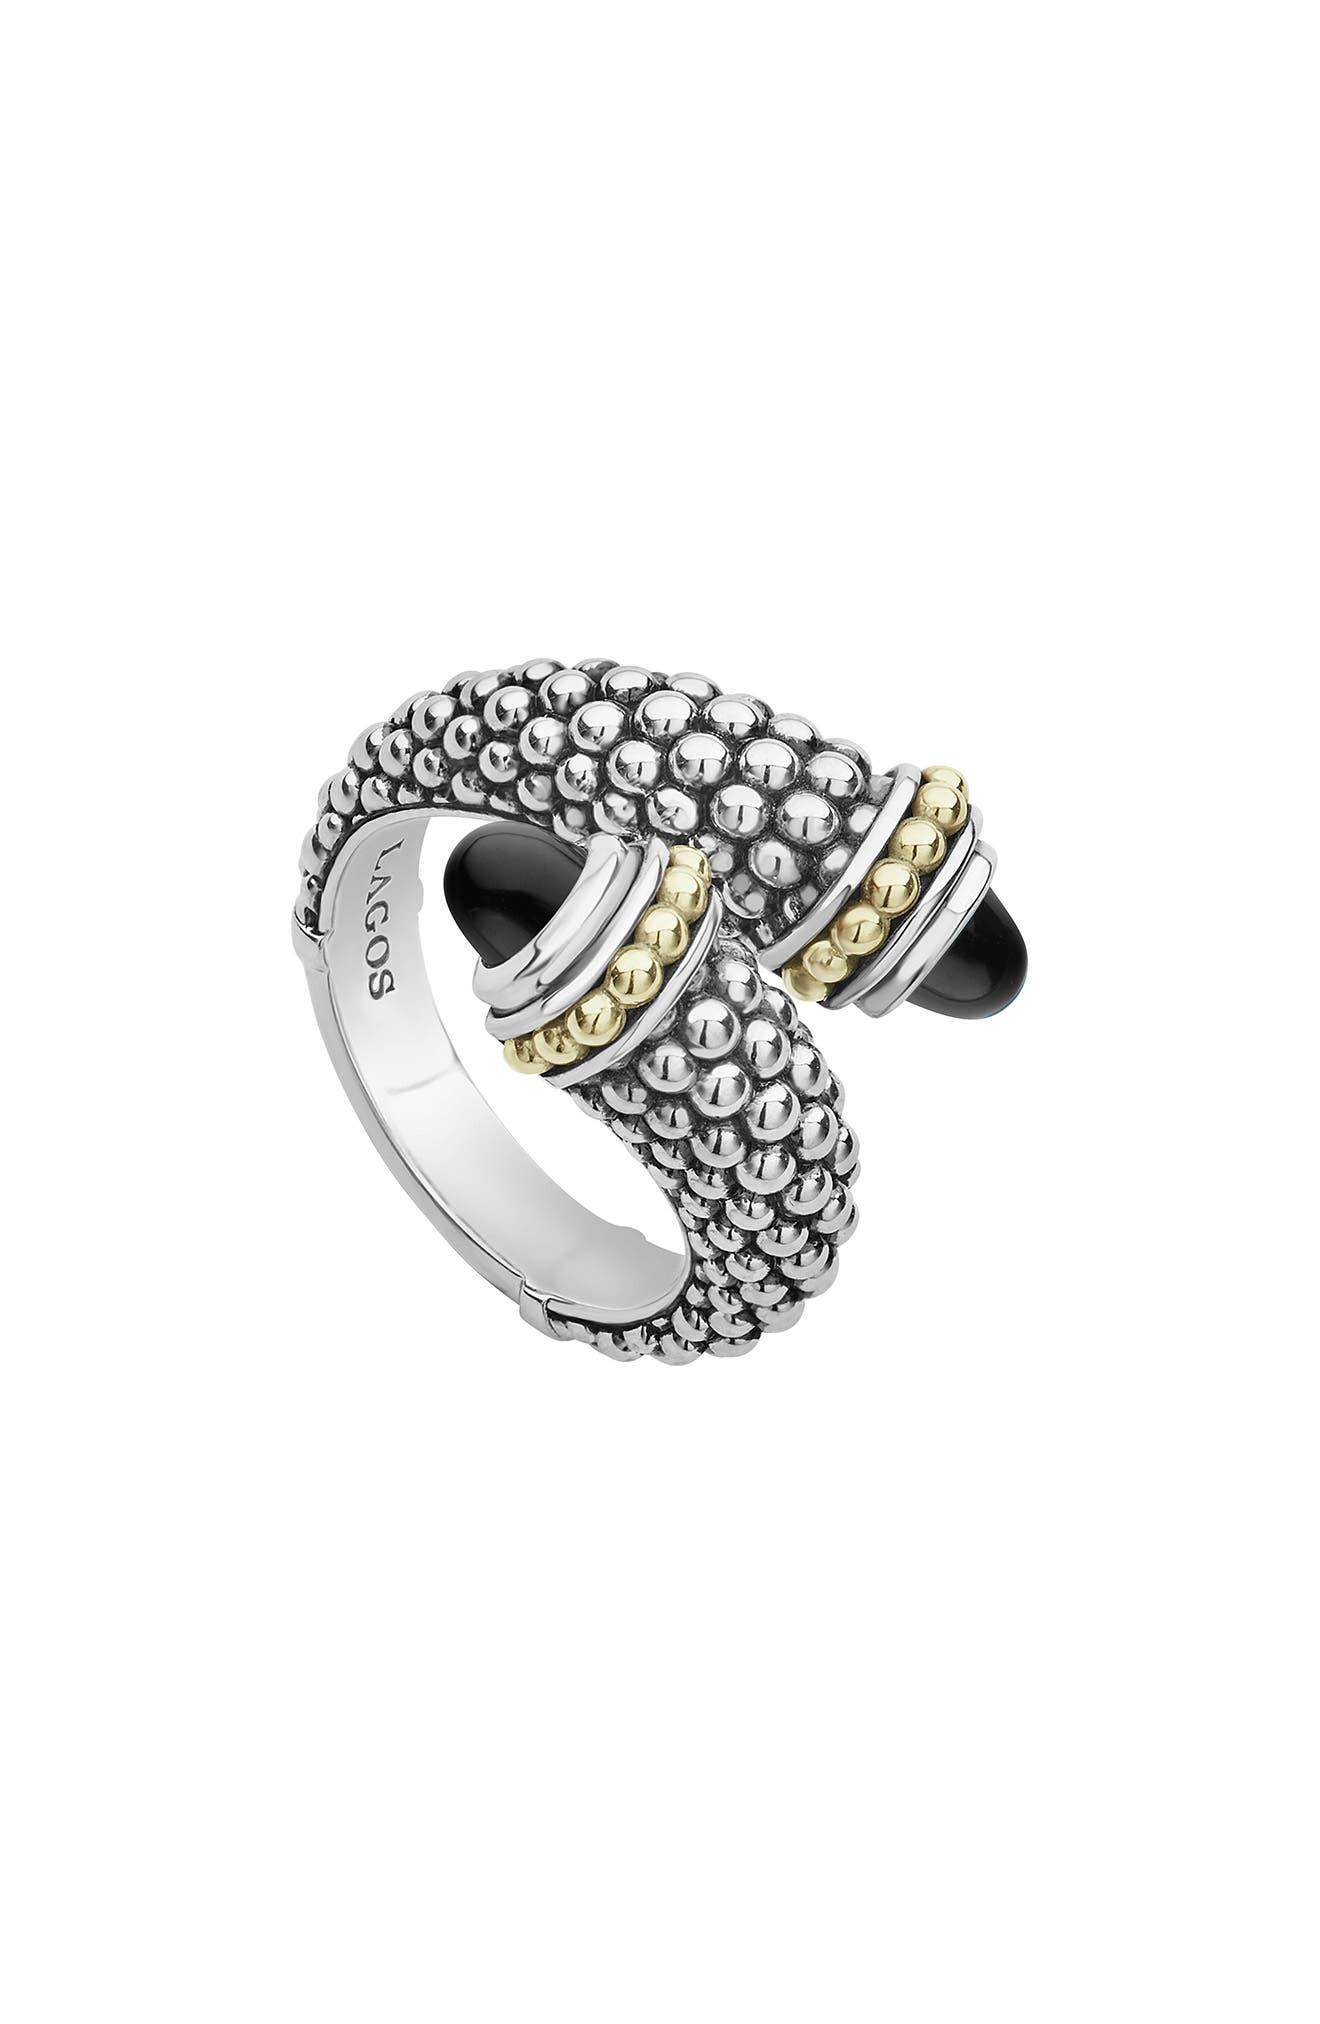 Signature Caviar Crossover Ring,                         Main,                         color, SILVER/ BLACK ONYX